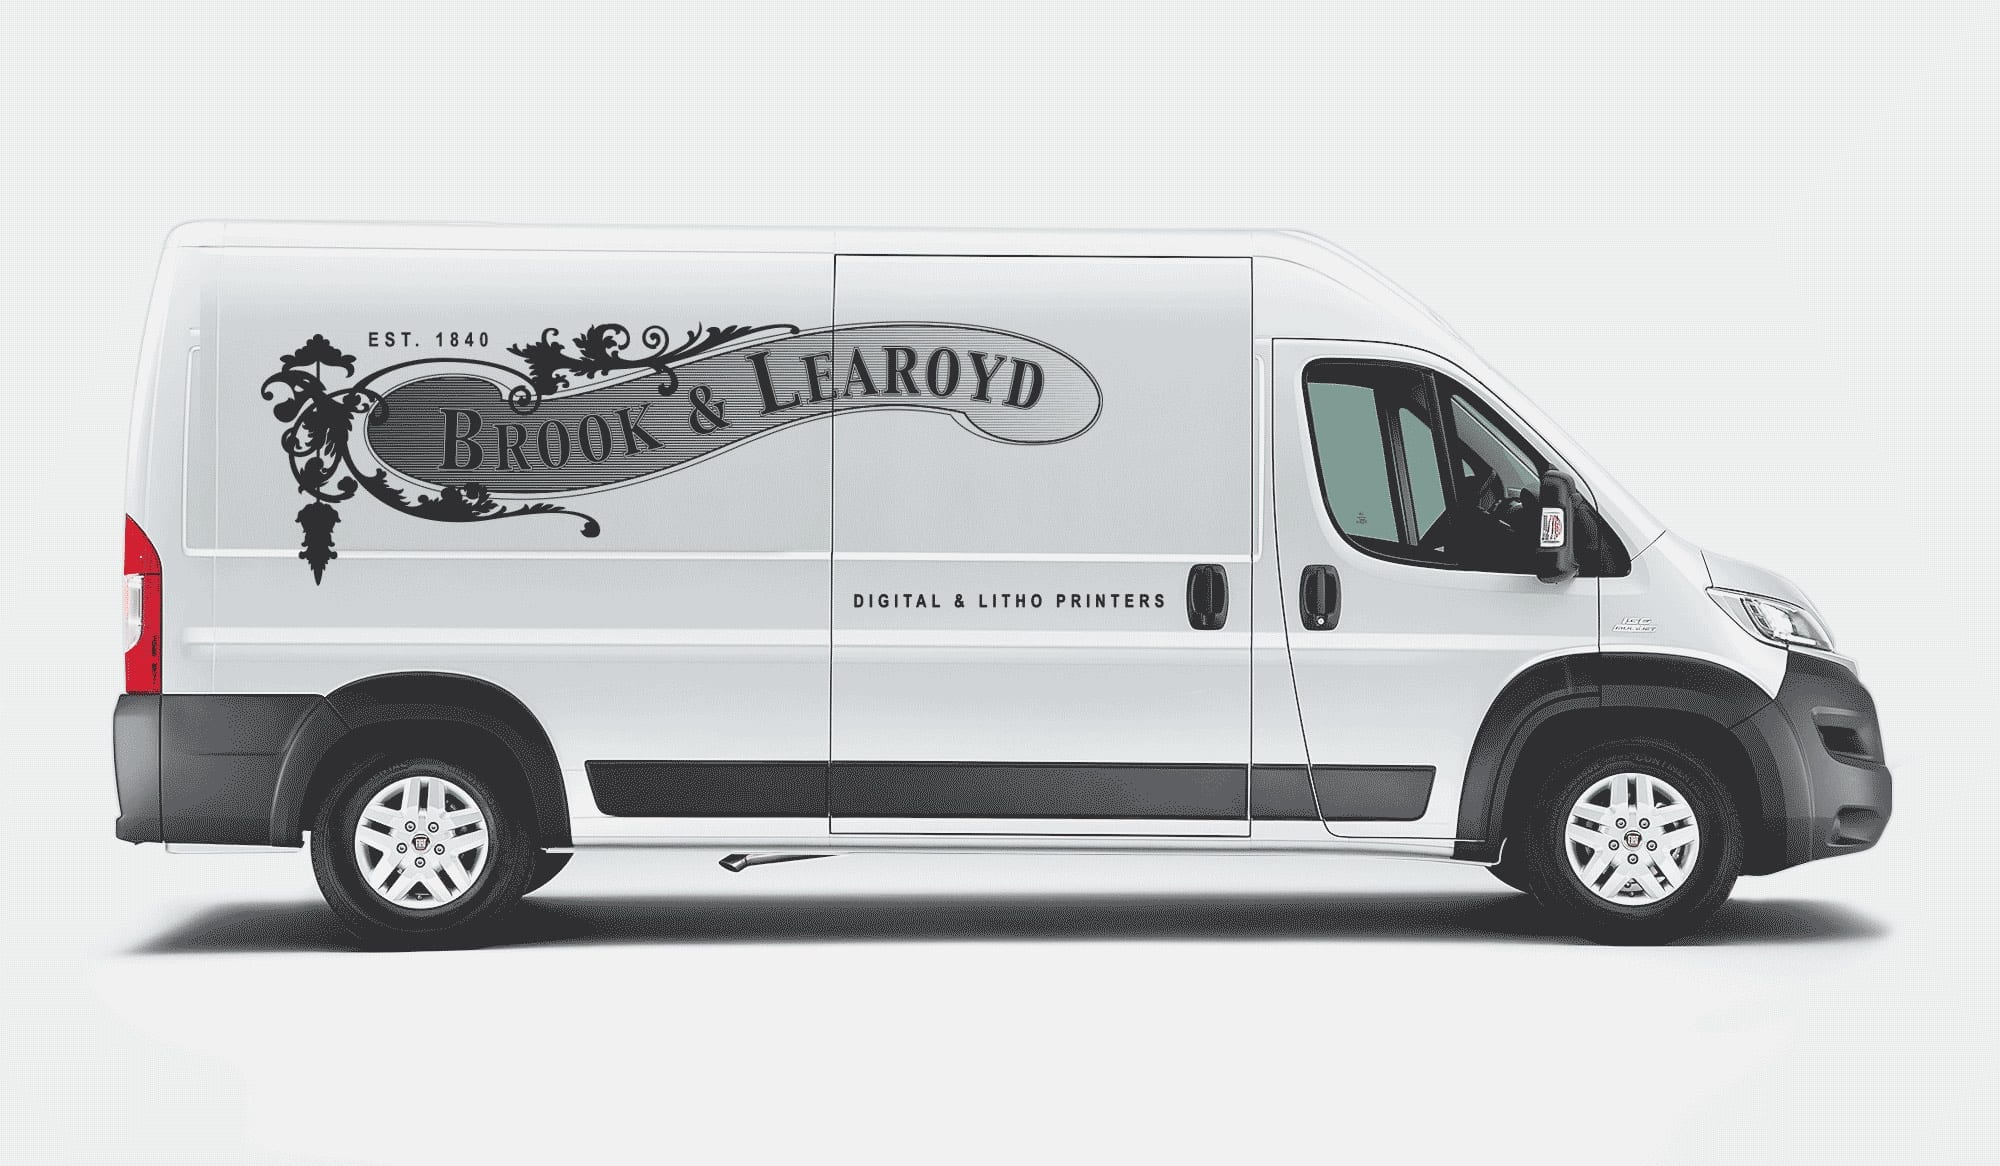 Mike-Garland-Freelance-Graphic-Designer-London-Brook-and-learoyd-Logo-Van-Decal-Side-Brand